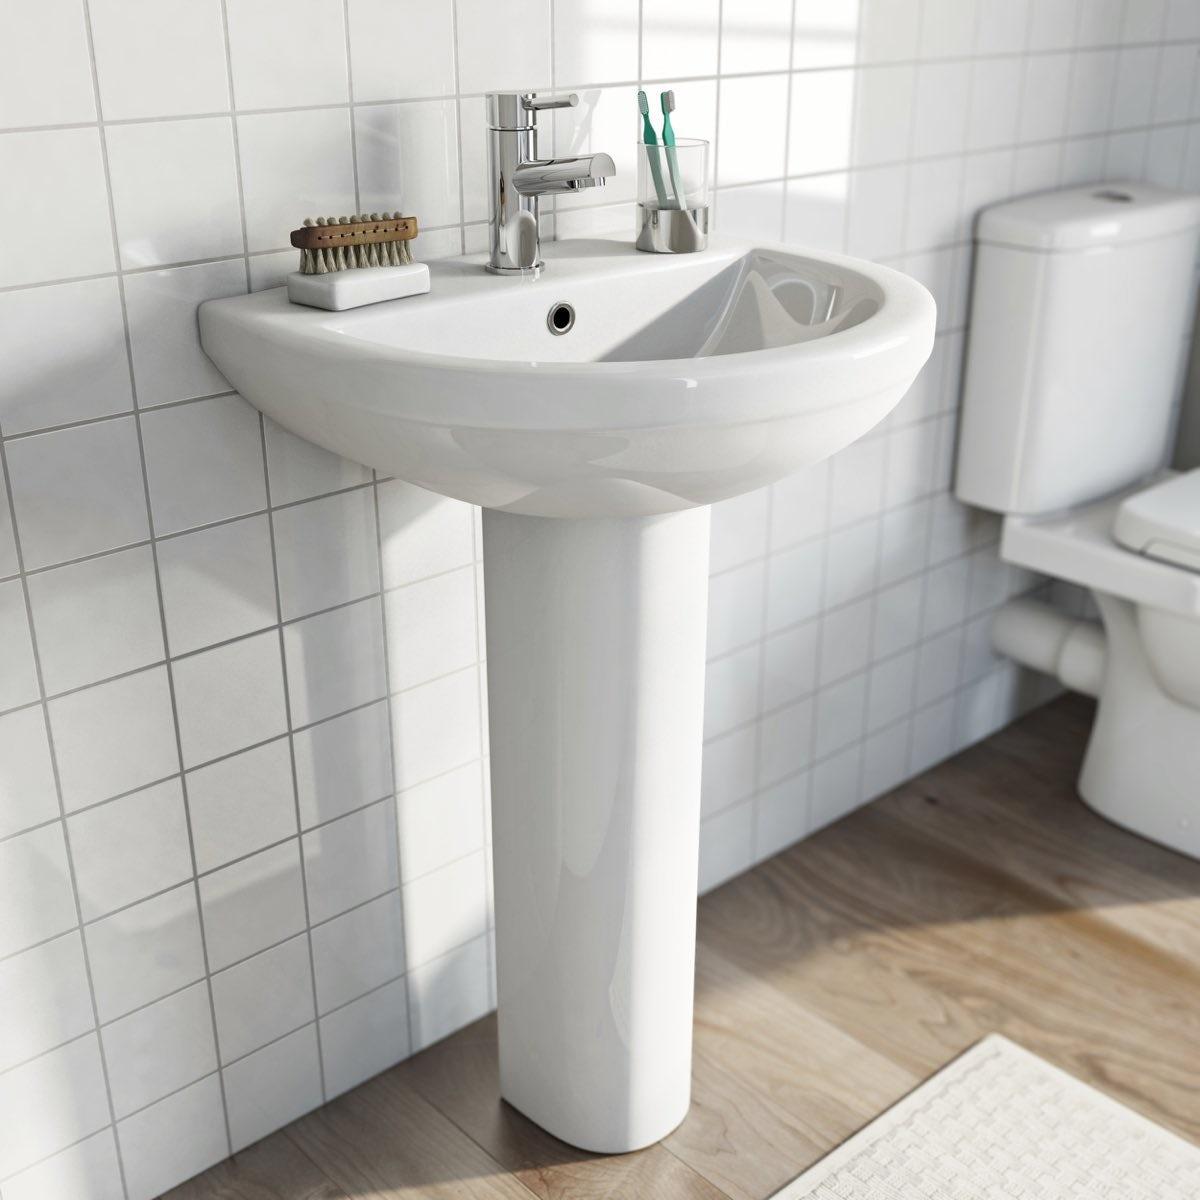 Eden 1 tap hole full pedestal basin